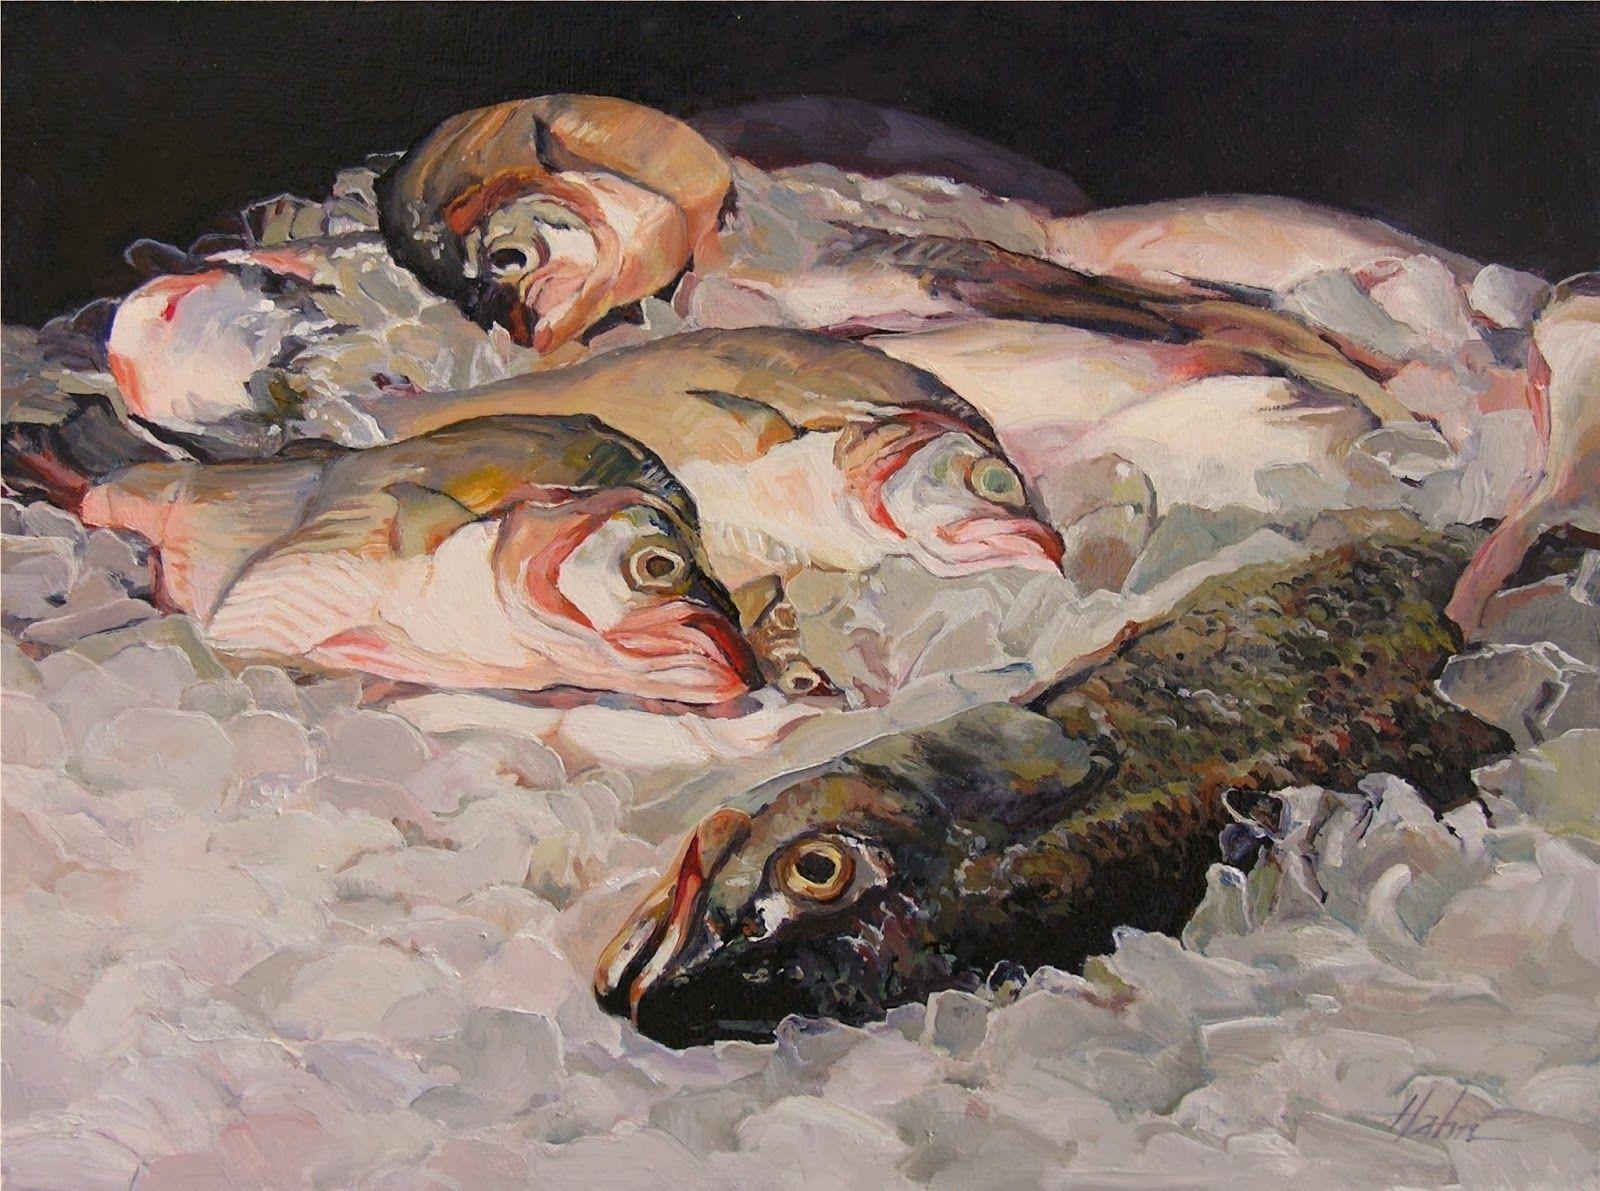 Felix murillo lleno de colores painting acrylic artwork fish art - Fish On Ice By Elaine Hahn Original Watercolors